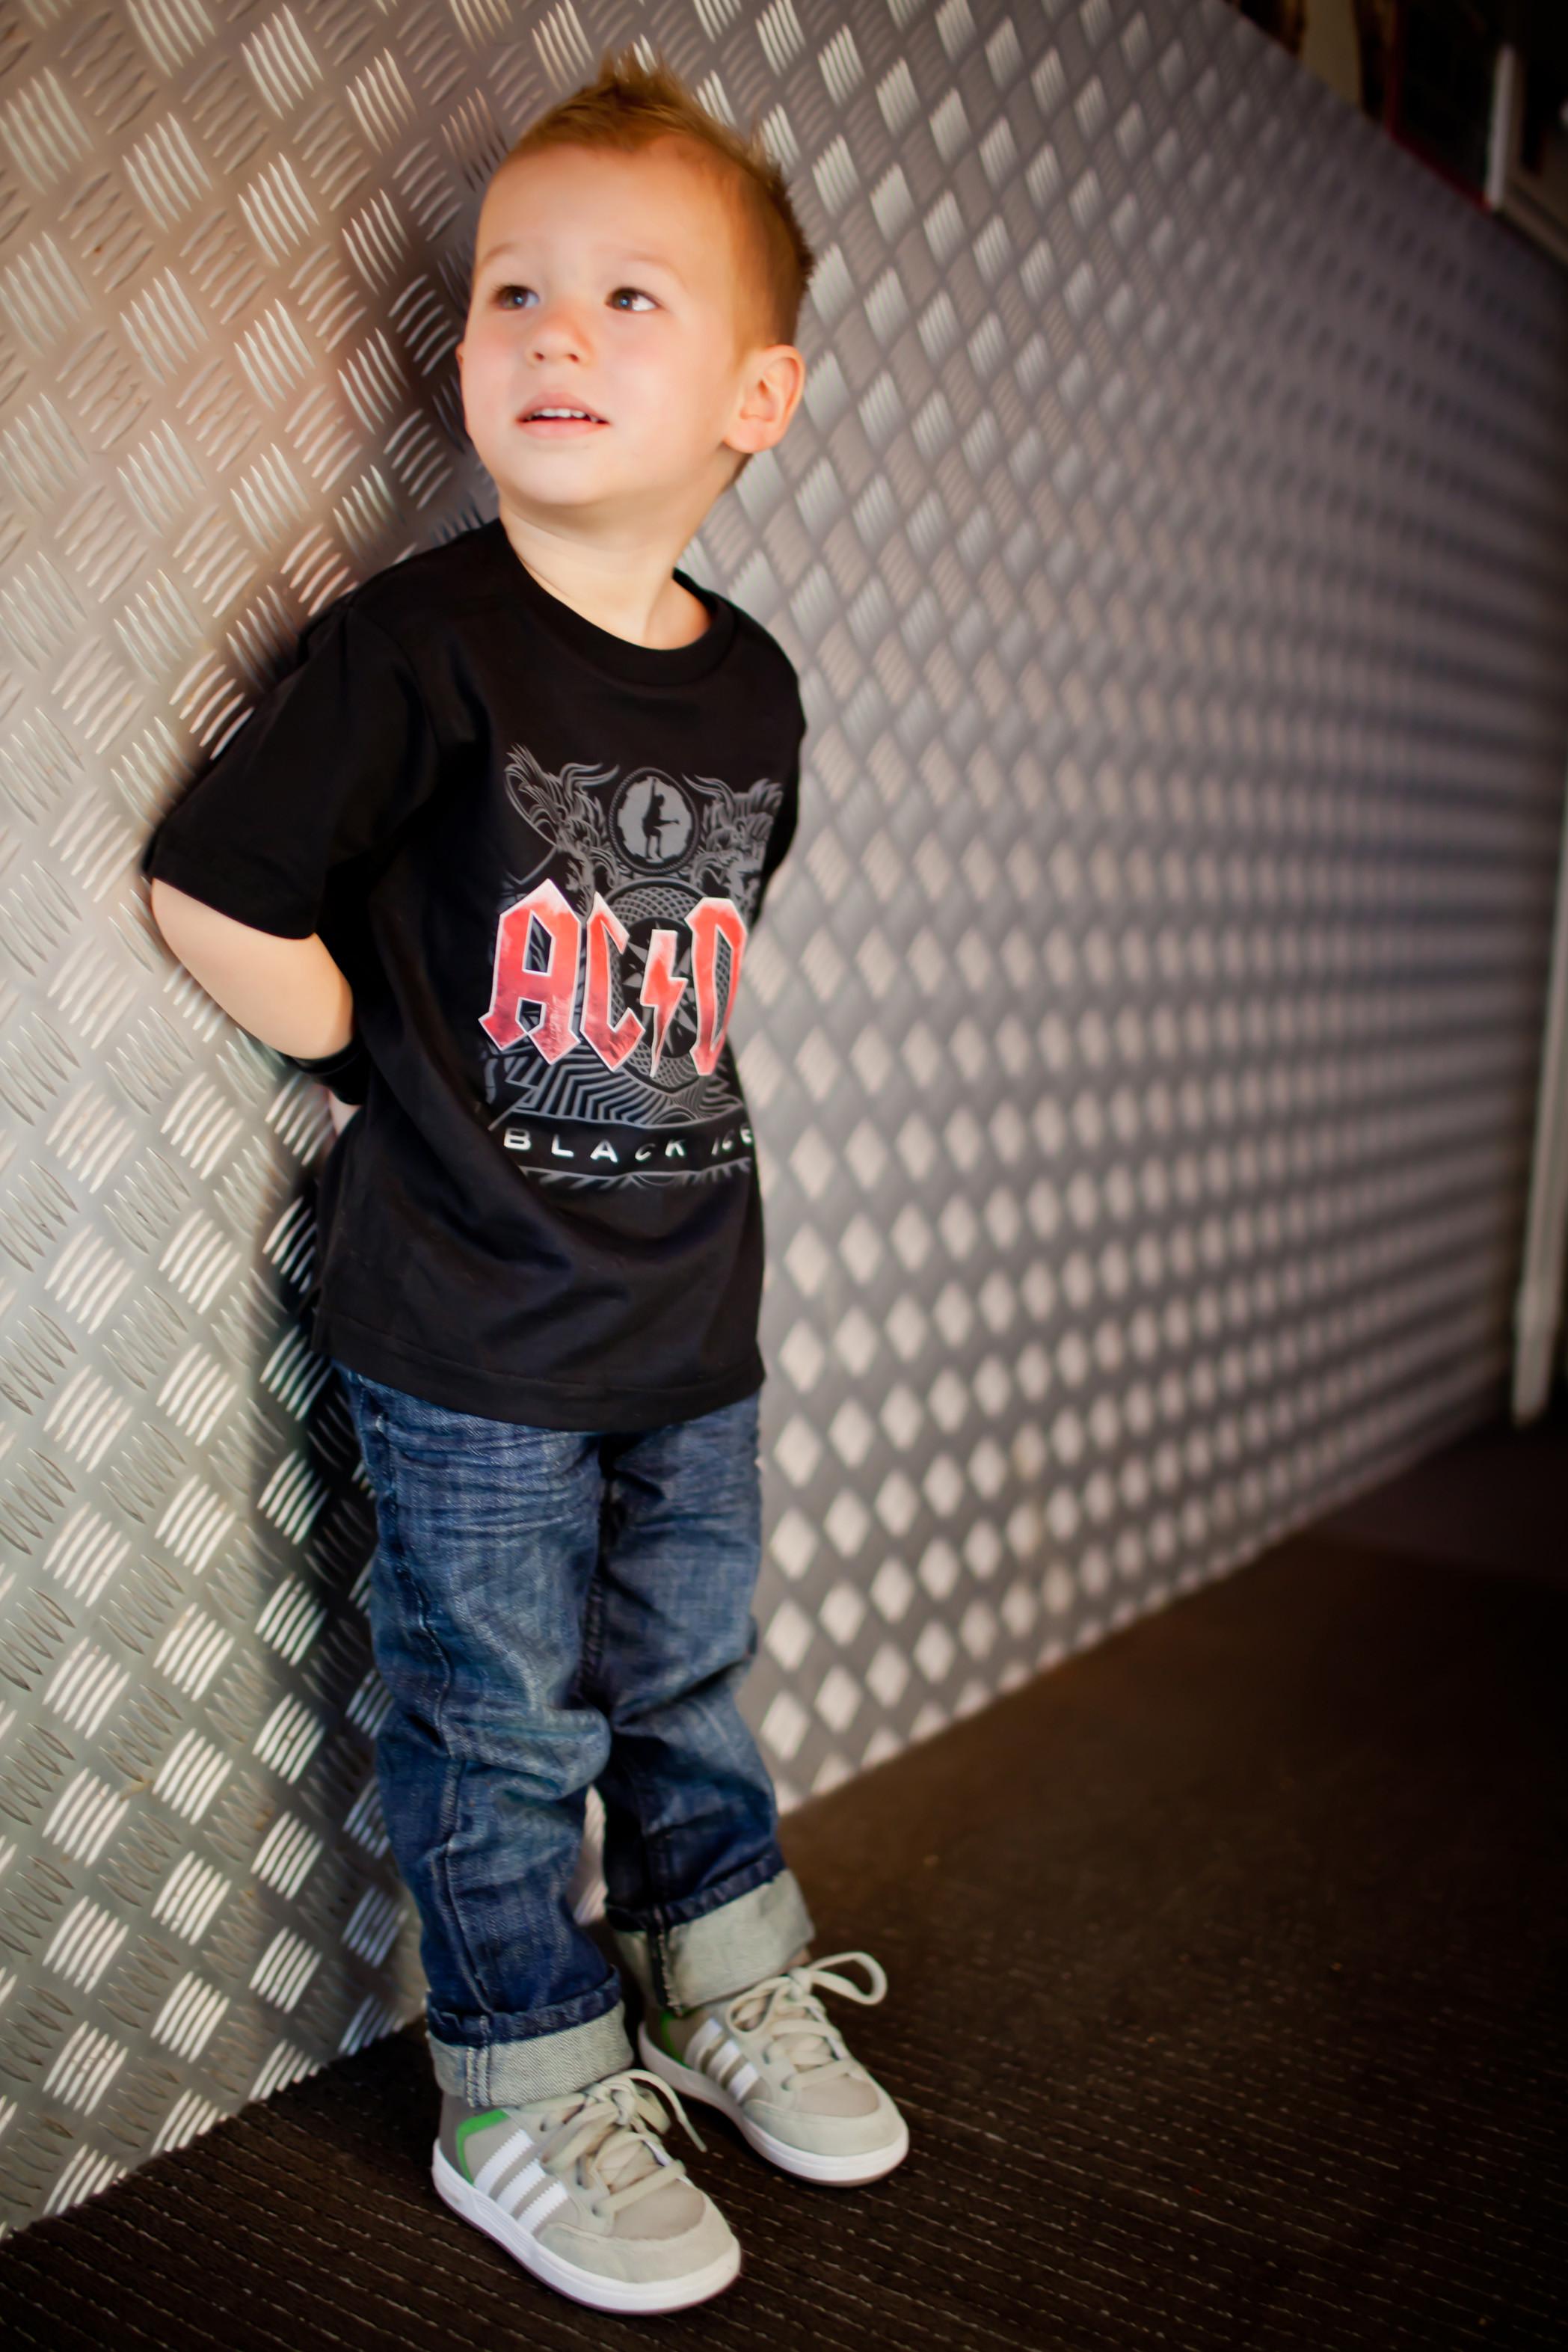 ACDC Kids T-Shirt Black Ice